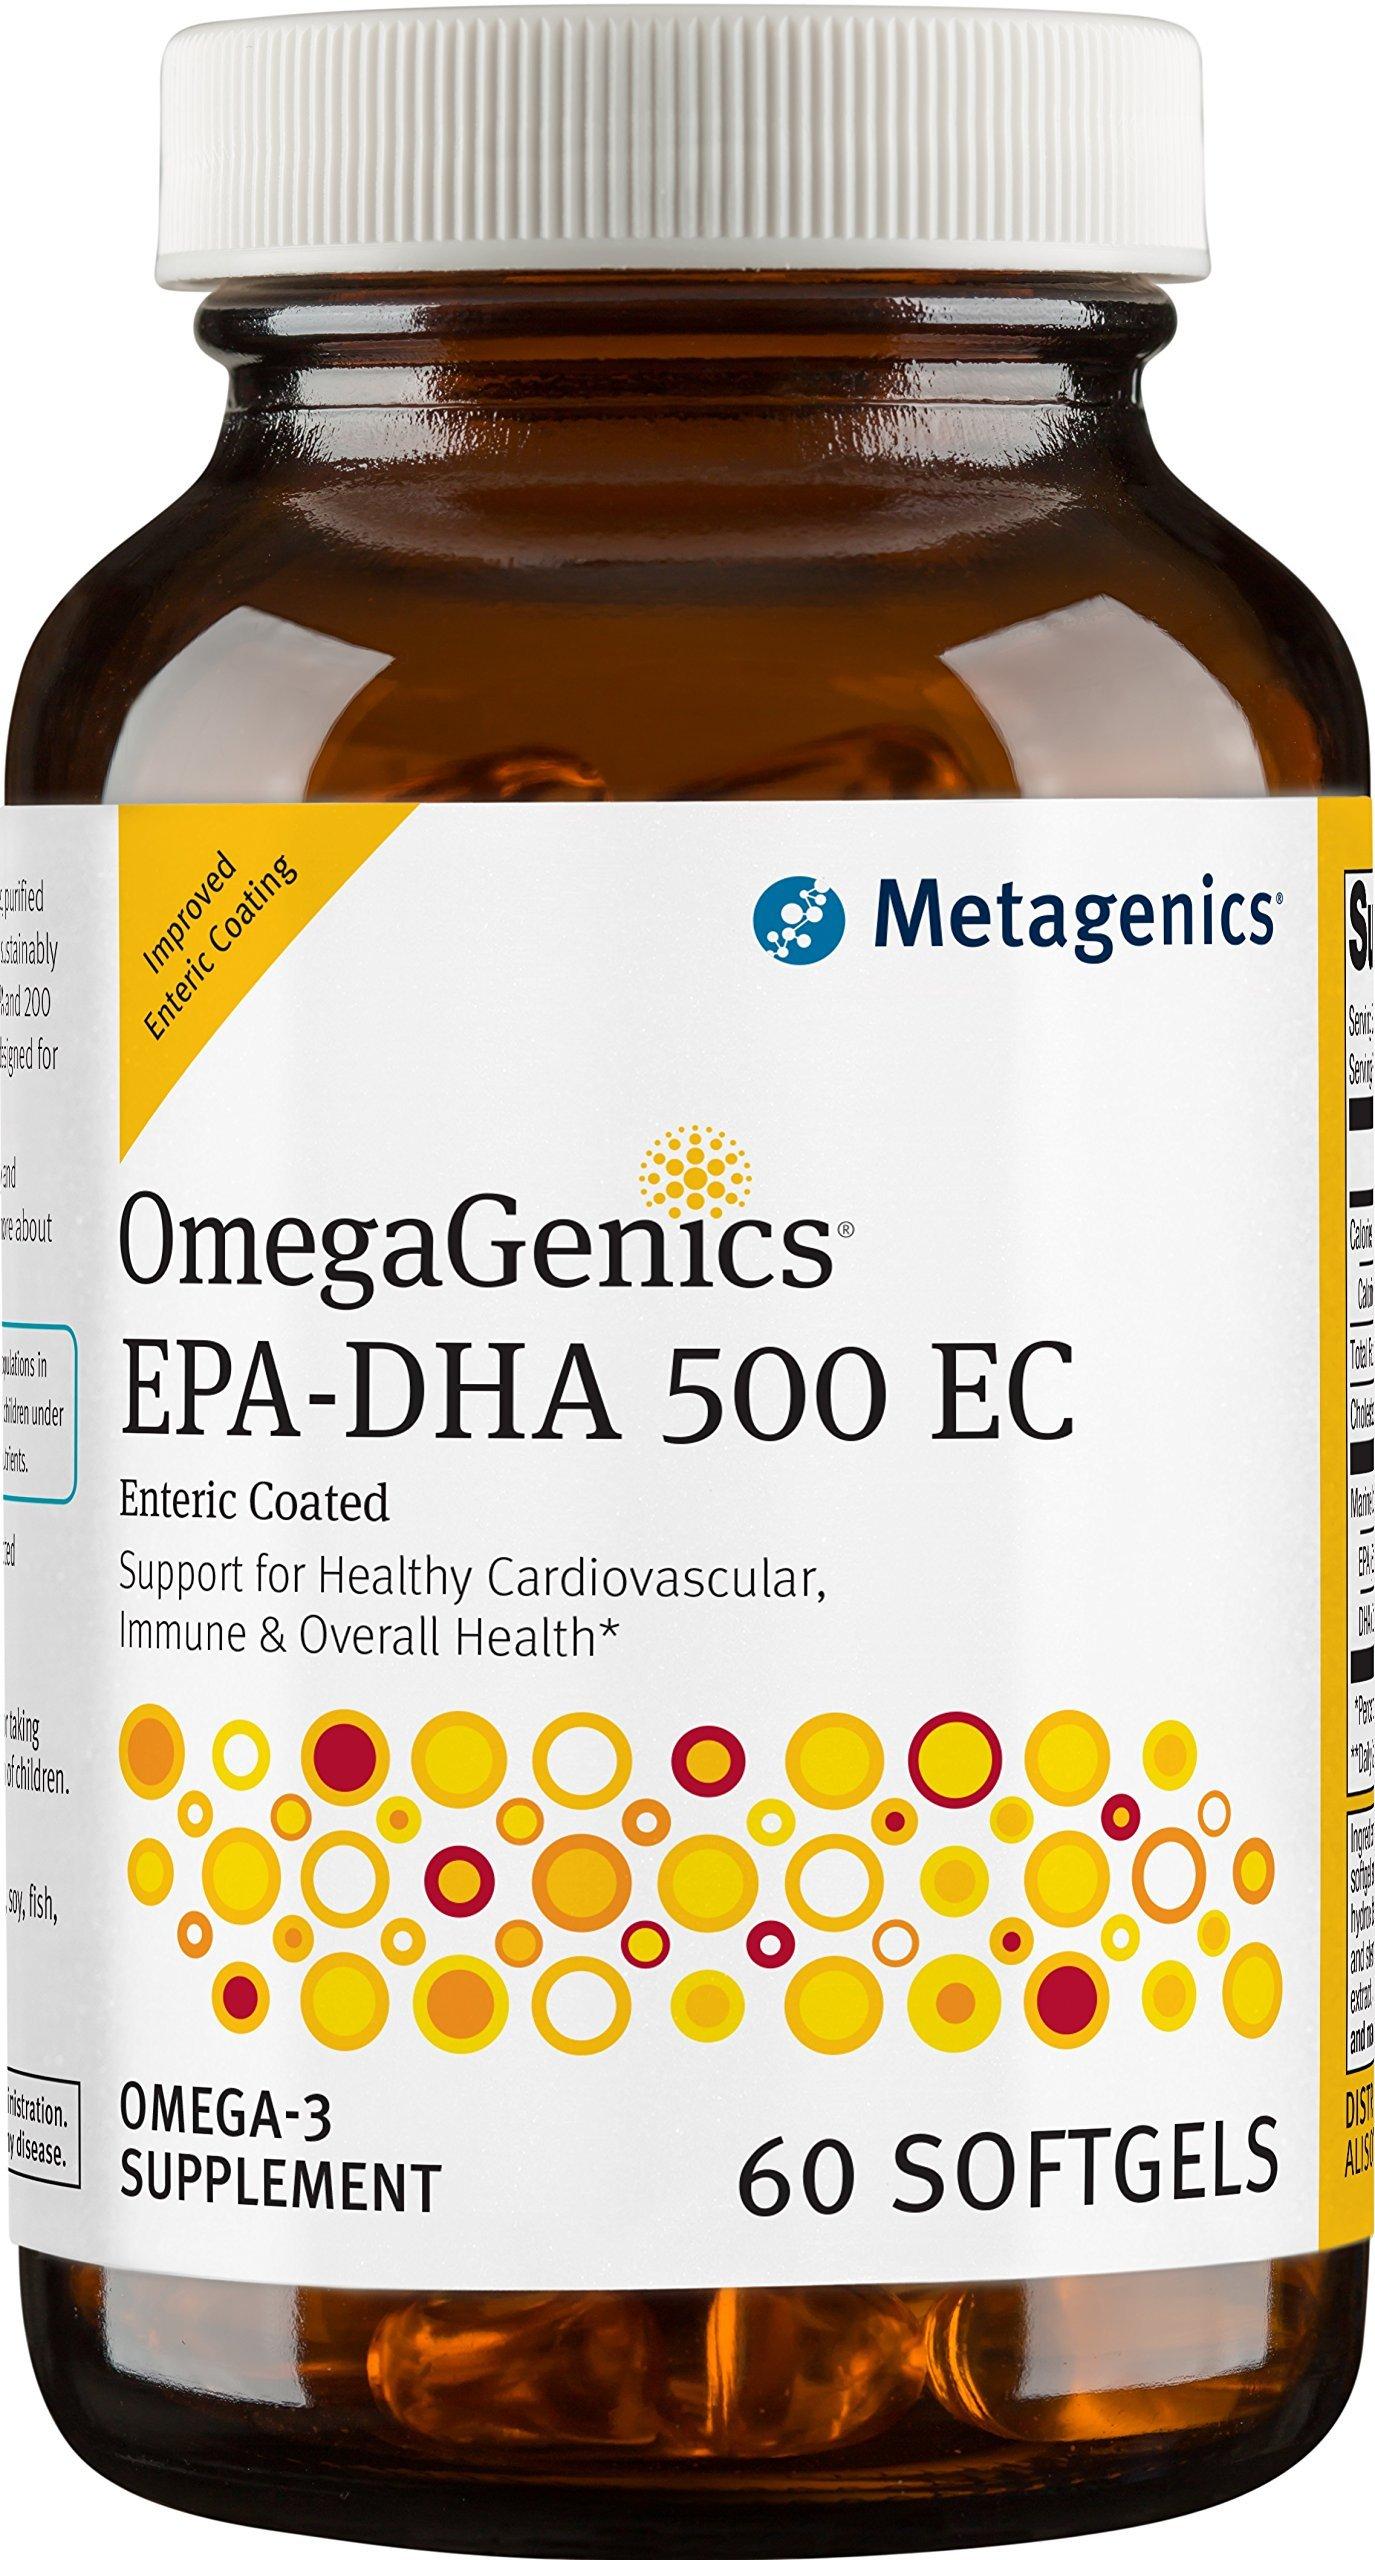 Metagenics - OmegaGenics EPA-DHA 500 EC, 60 Count